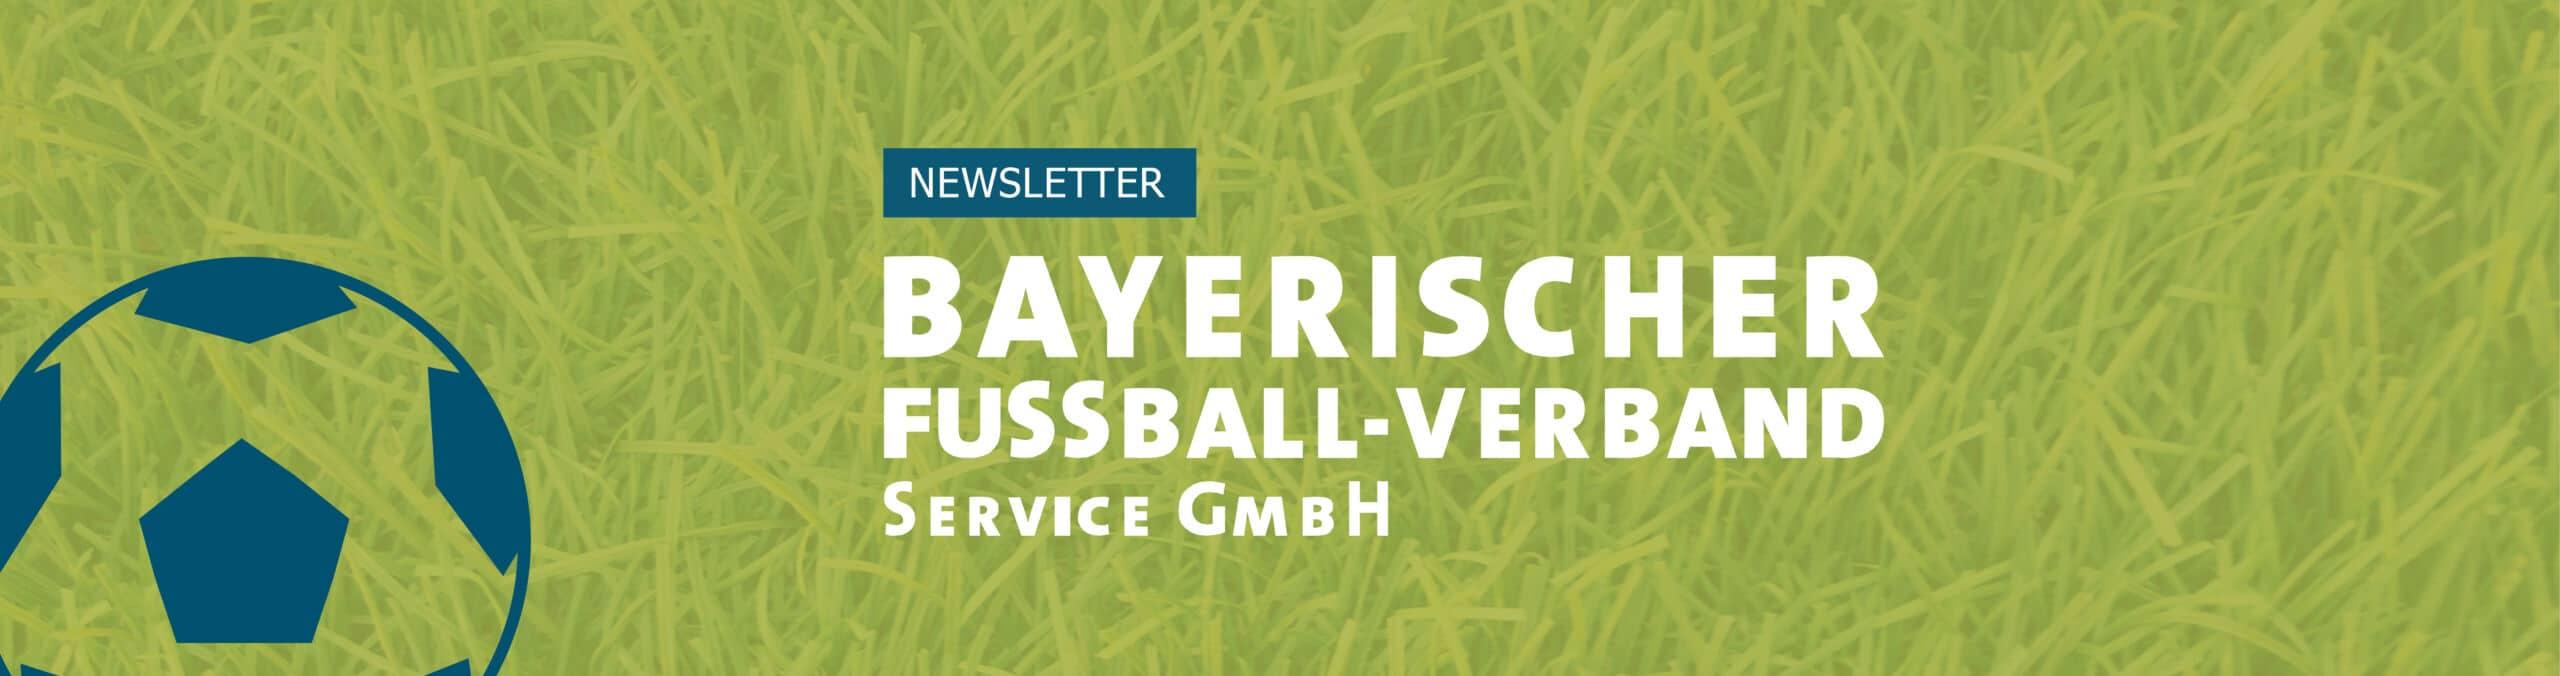 Titelbild_Newsletter_BFV_Service_GmbH